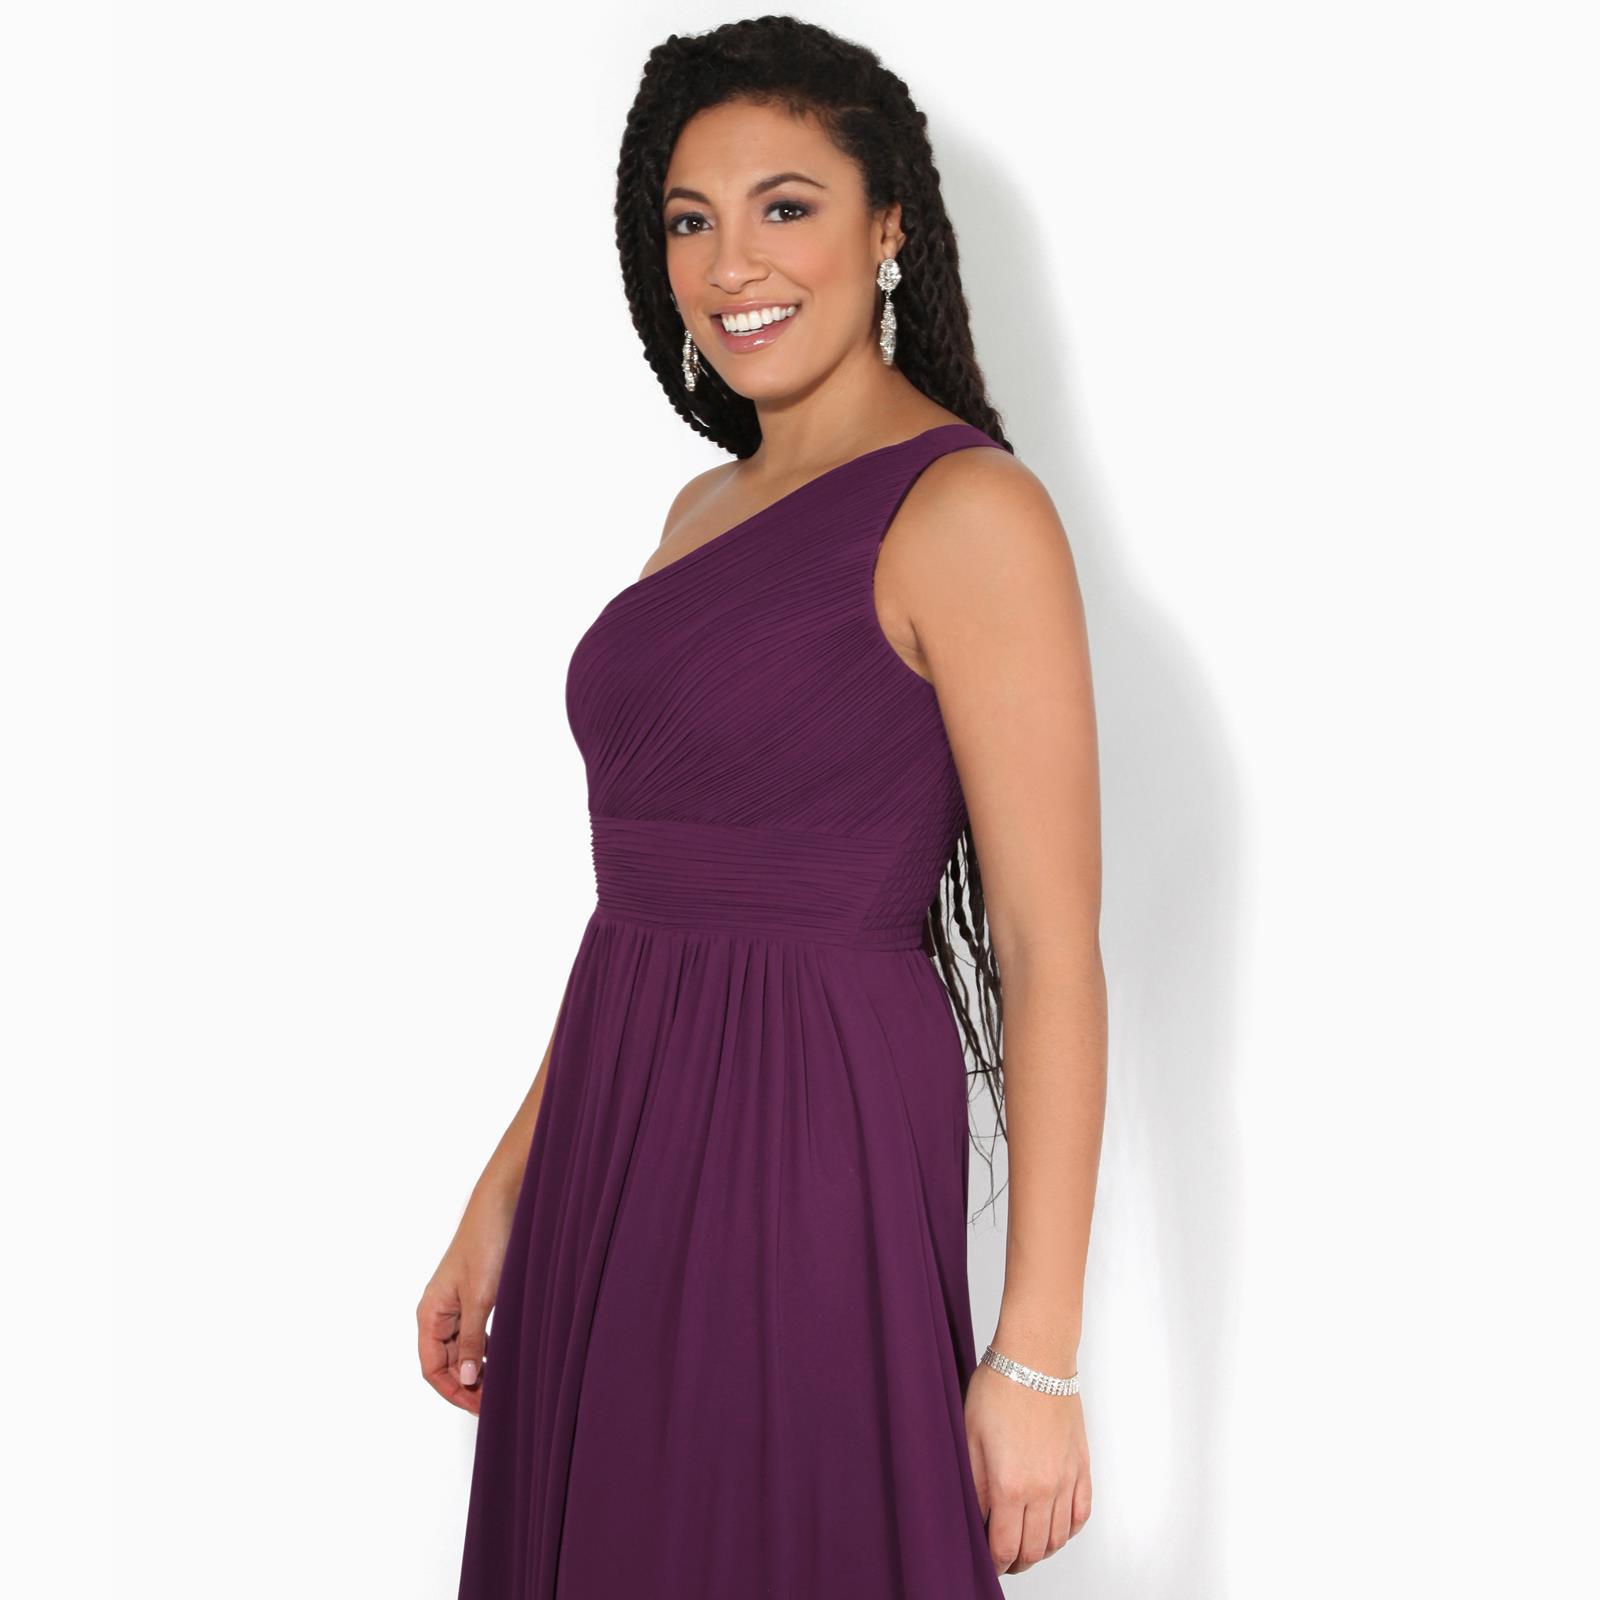 Womens-Wedding-Bridesmaid-Prom-Dress-Formal-One-Off-Shoulder-Long-Evening-8-18 thumbnail 7